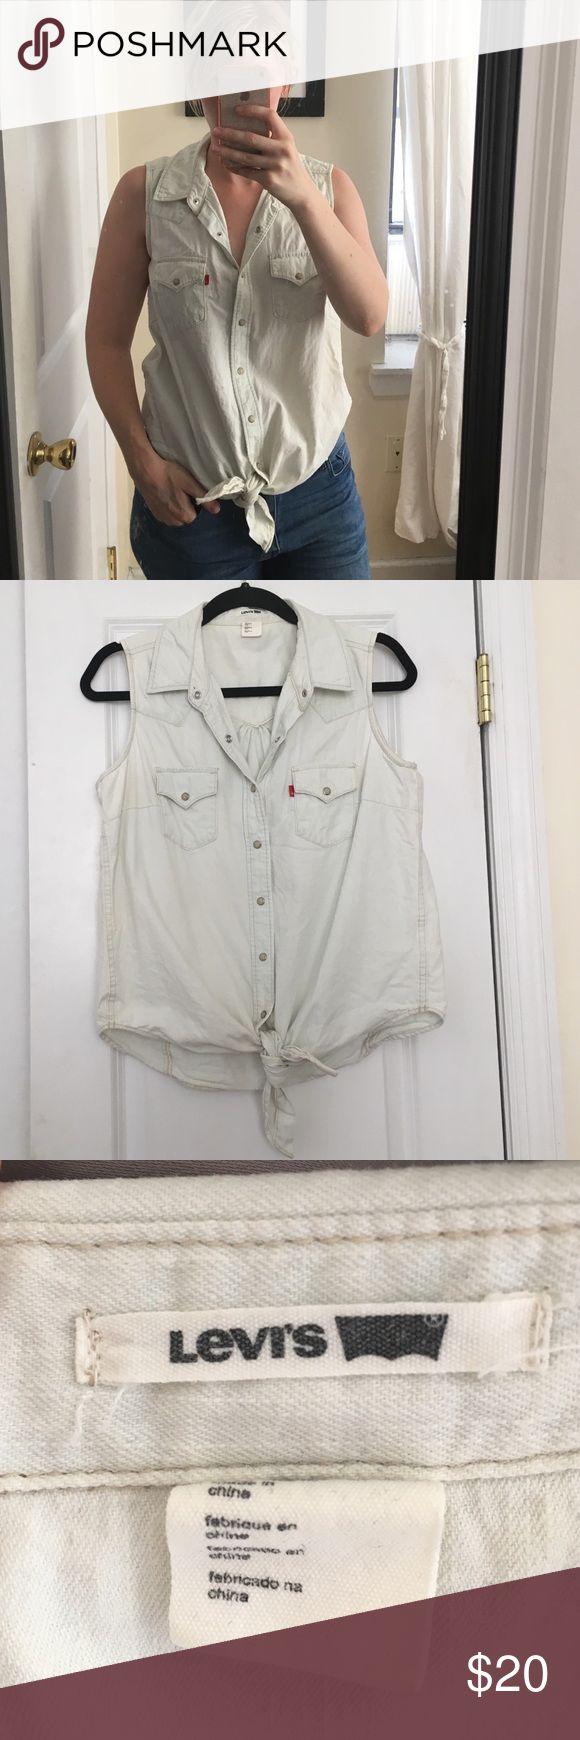 Levi's sleeveless denim shirt Super light wash denim sleeveless shirt. Button closure, 100% cotton. Worn once. Levi's Tops Button Down Shirts